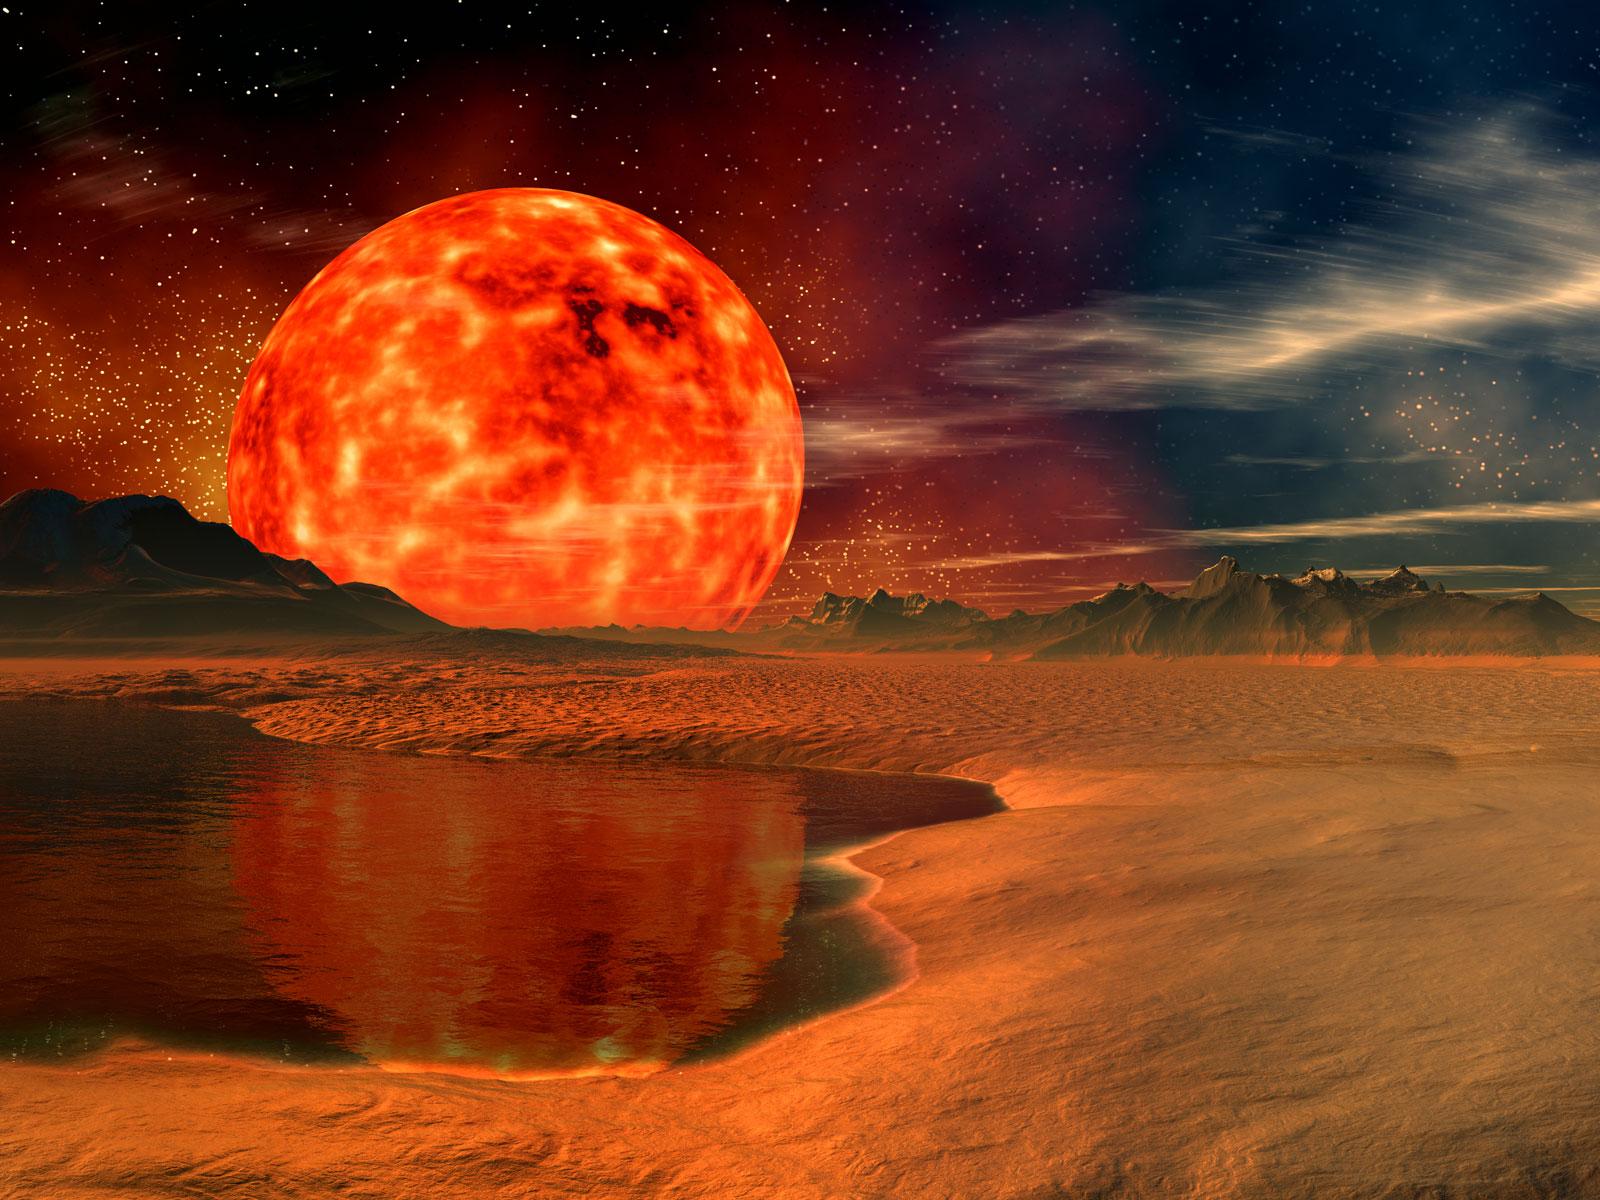 http://3.bp.blogspot.com/_qK2ozlw0SJA/TNObplvbvfI/AAAAAAAAAZo/teNdIts9VfU/s1600/giant-red-lava-planet.jpg